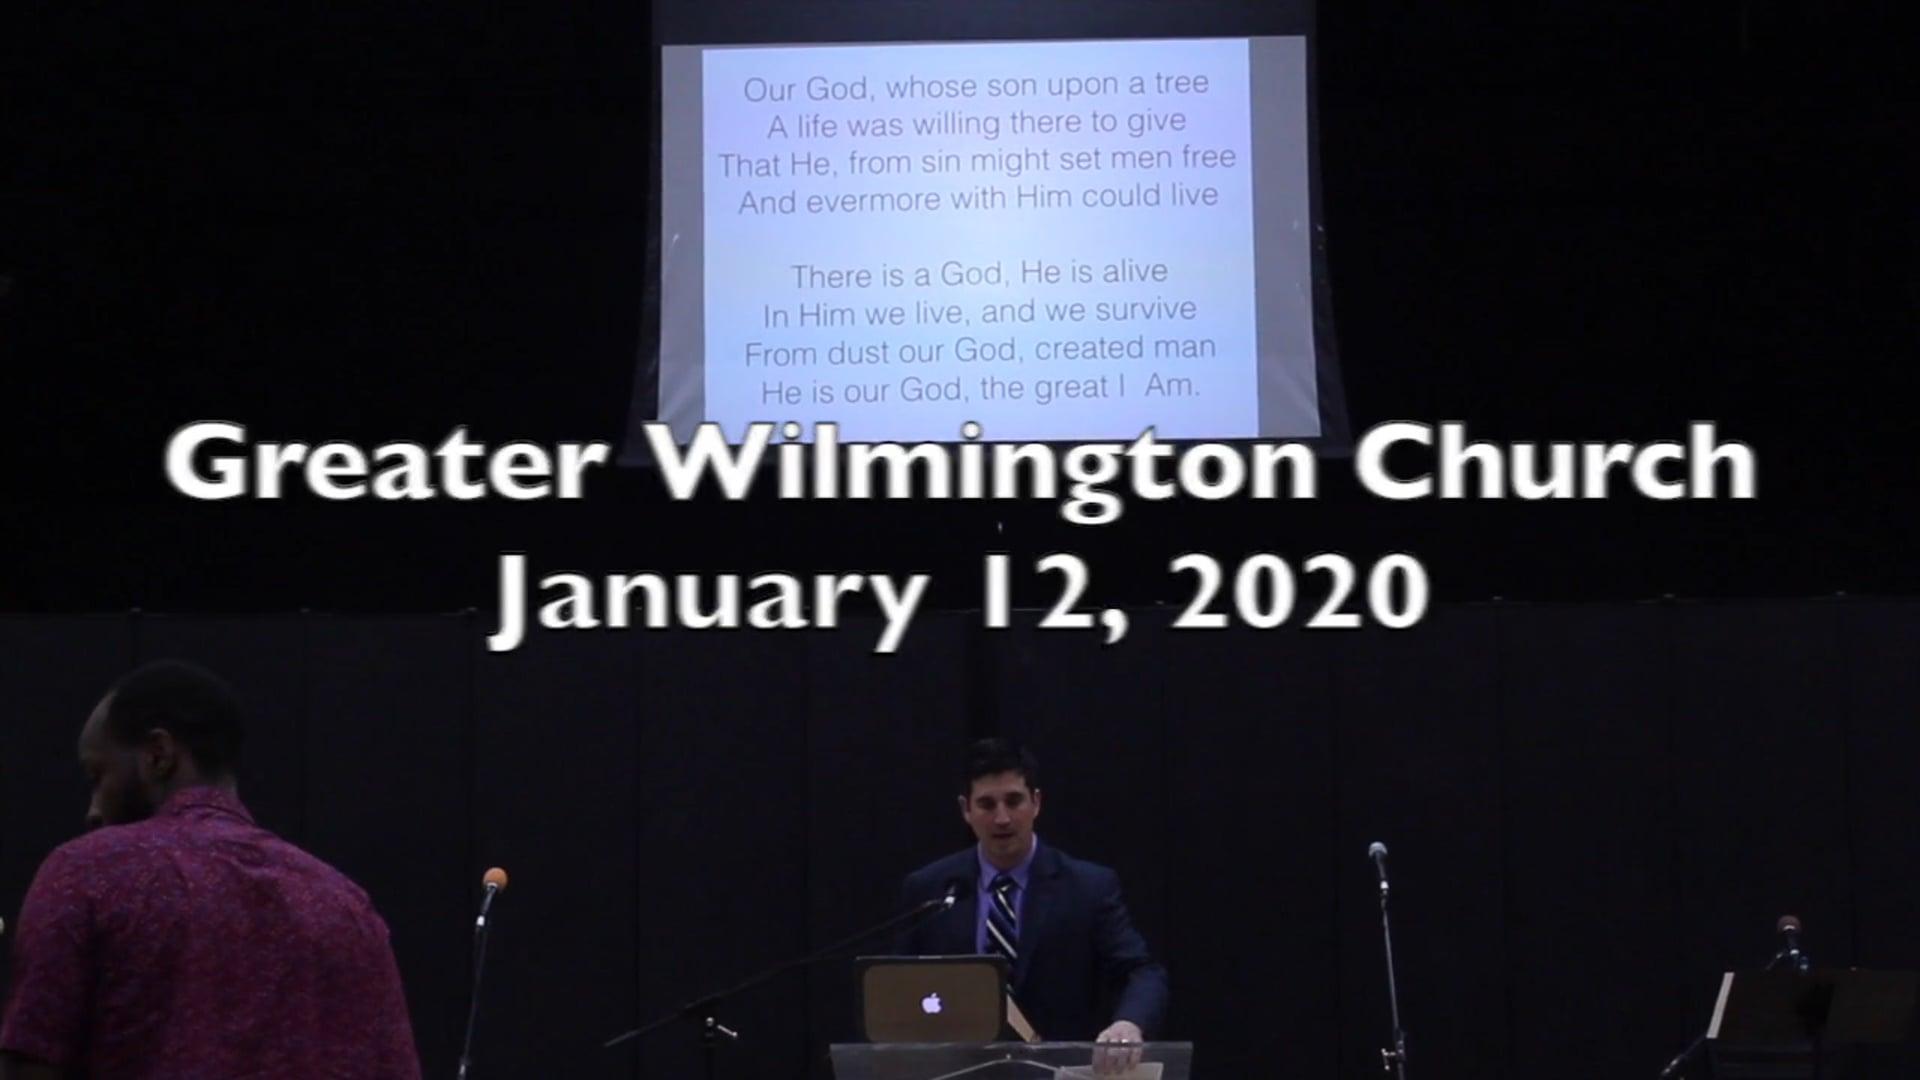 GWC Service - January 12, 2020